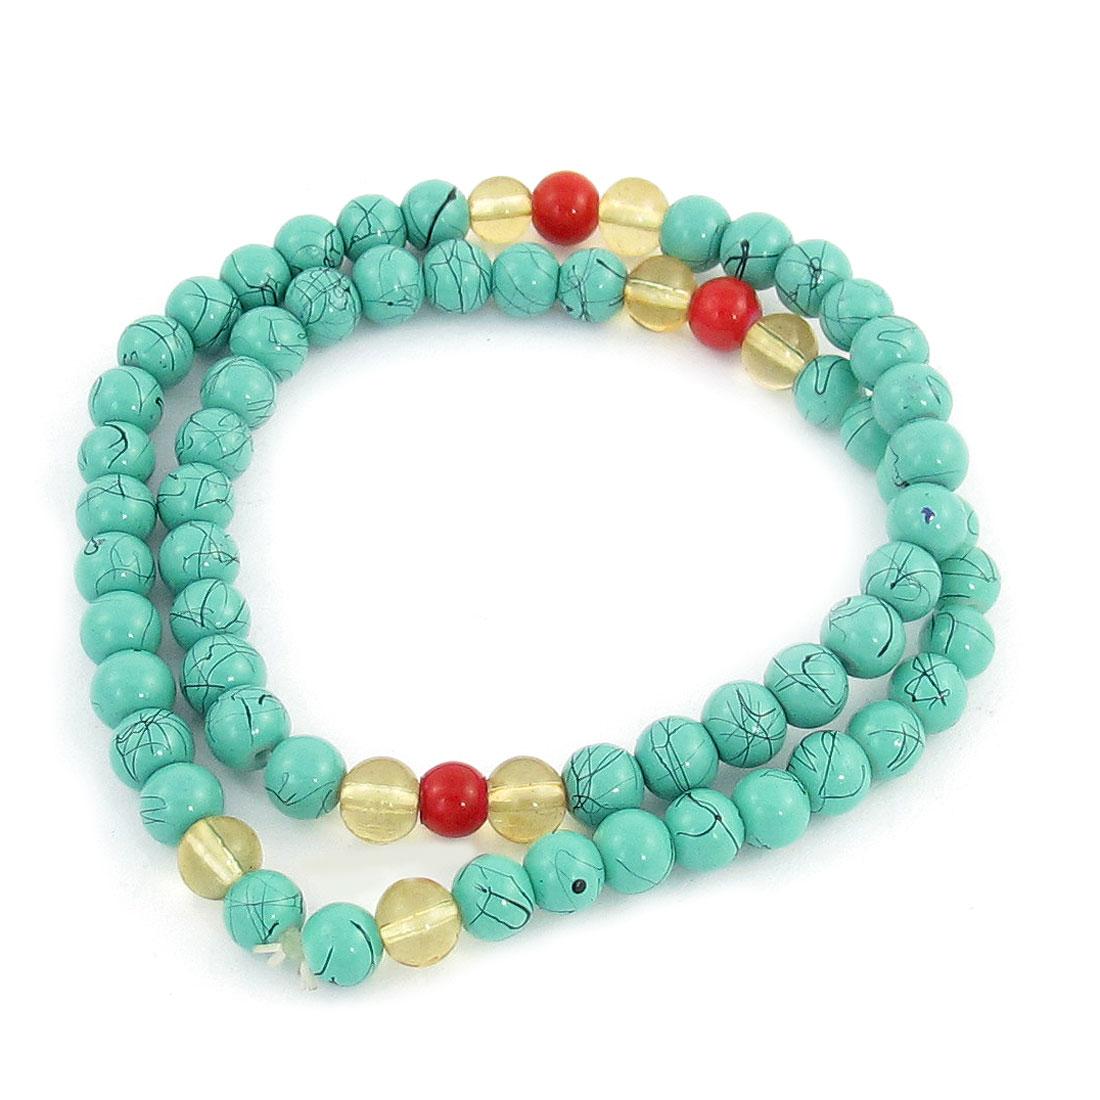 Cyan Beads Decor Elastic Band Adjustable Wrist Bracelet for Lady